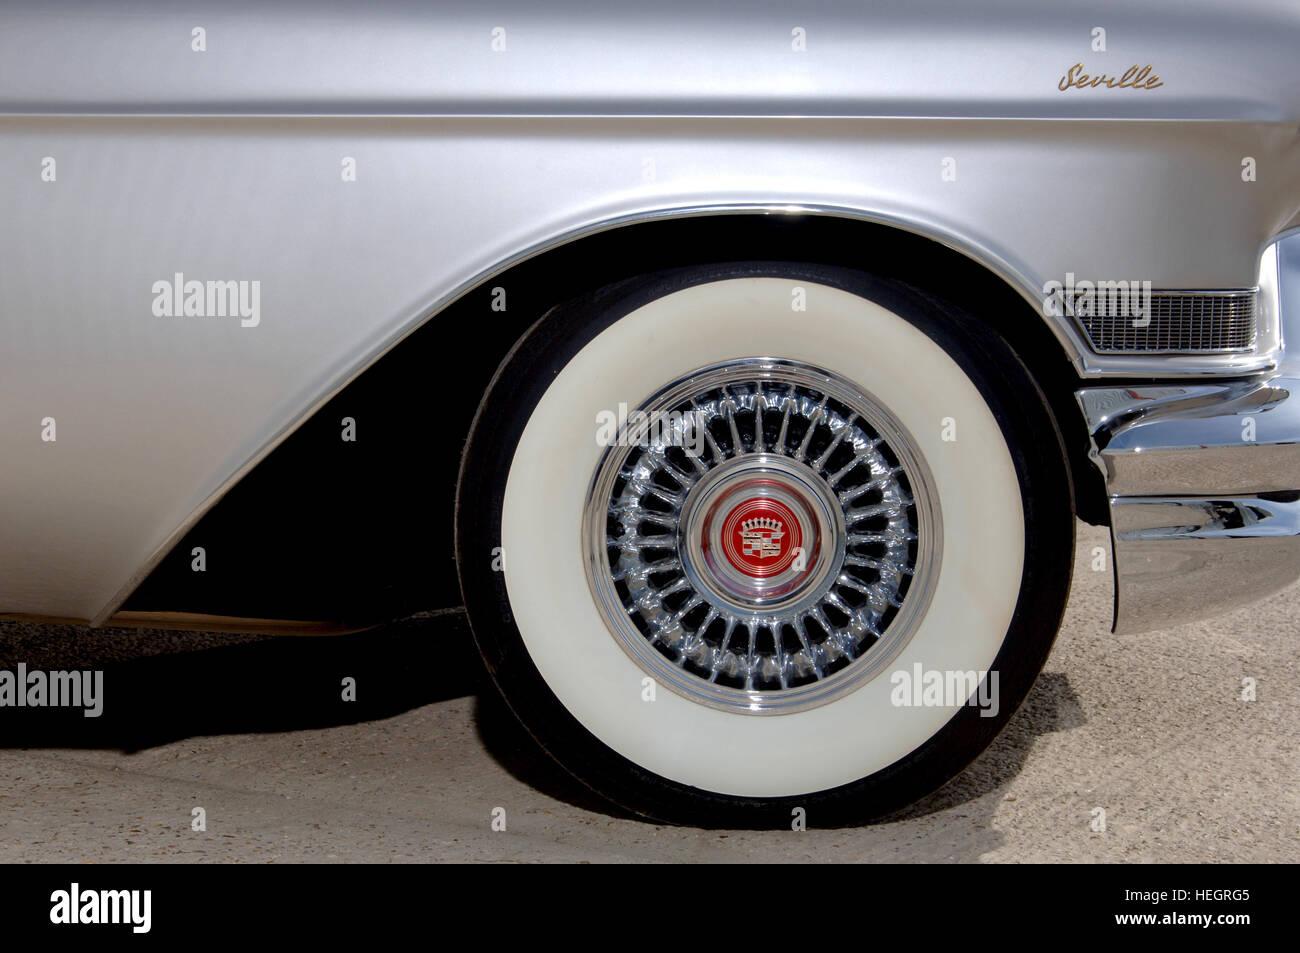 Car Tyre Wall Stockfotos & Car Tyre Wall Bilder - Alamy